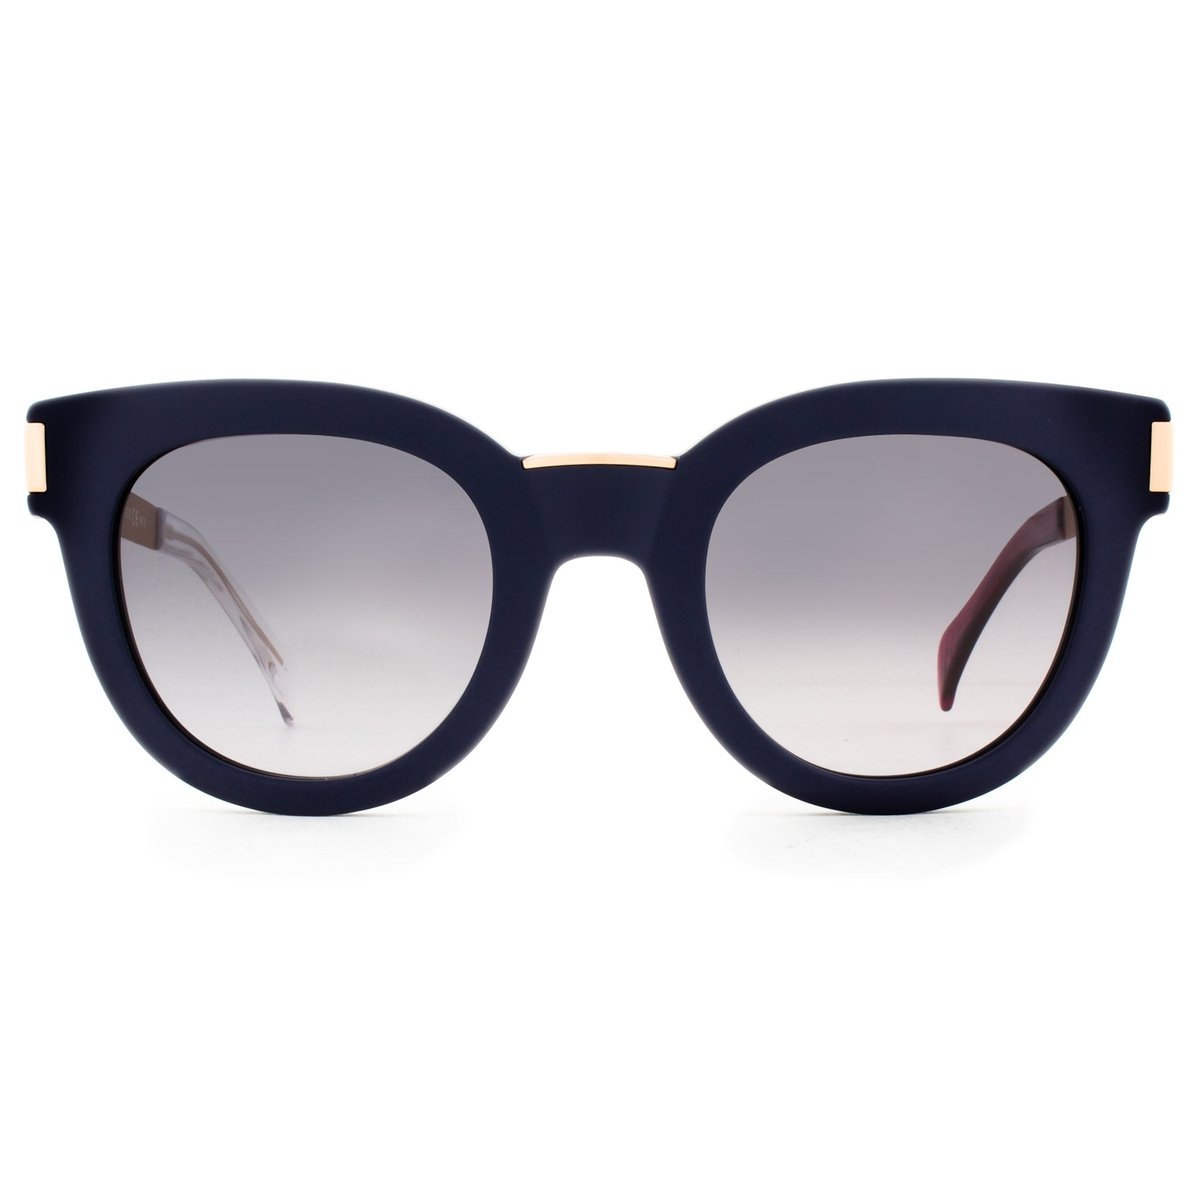 0f1f9b76fa0a3 Óculos Tommy Hilfiger TH1379 S QE4 49 - Compre Agora